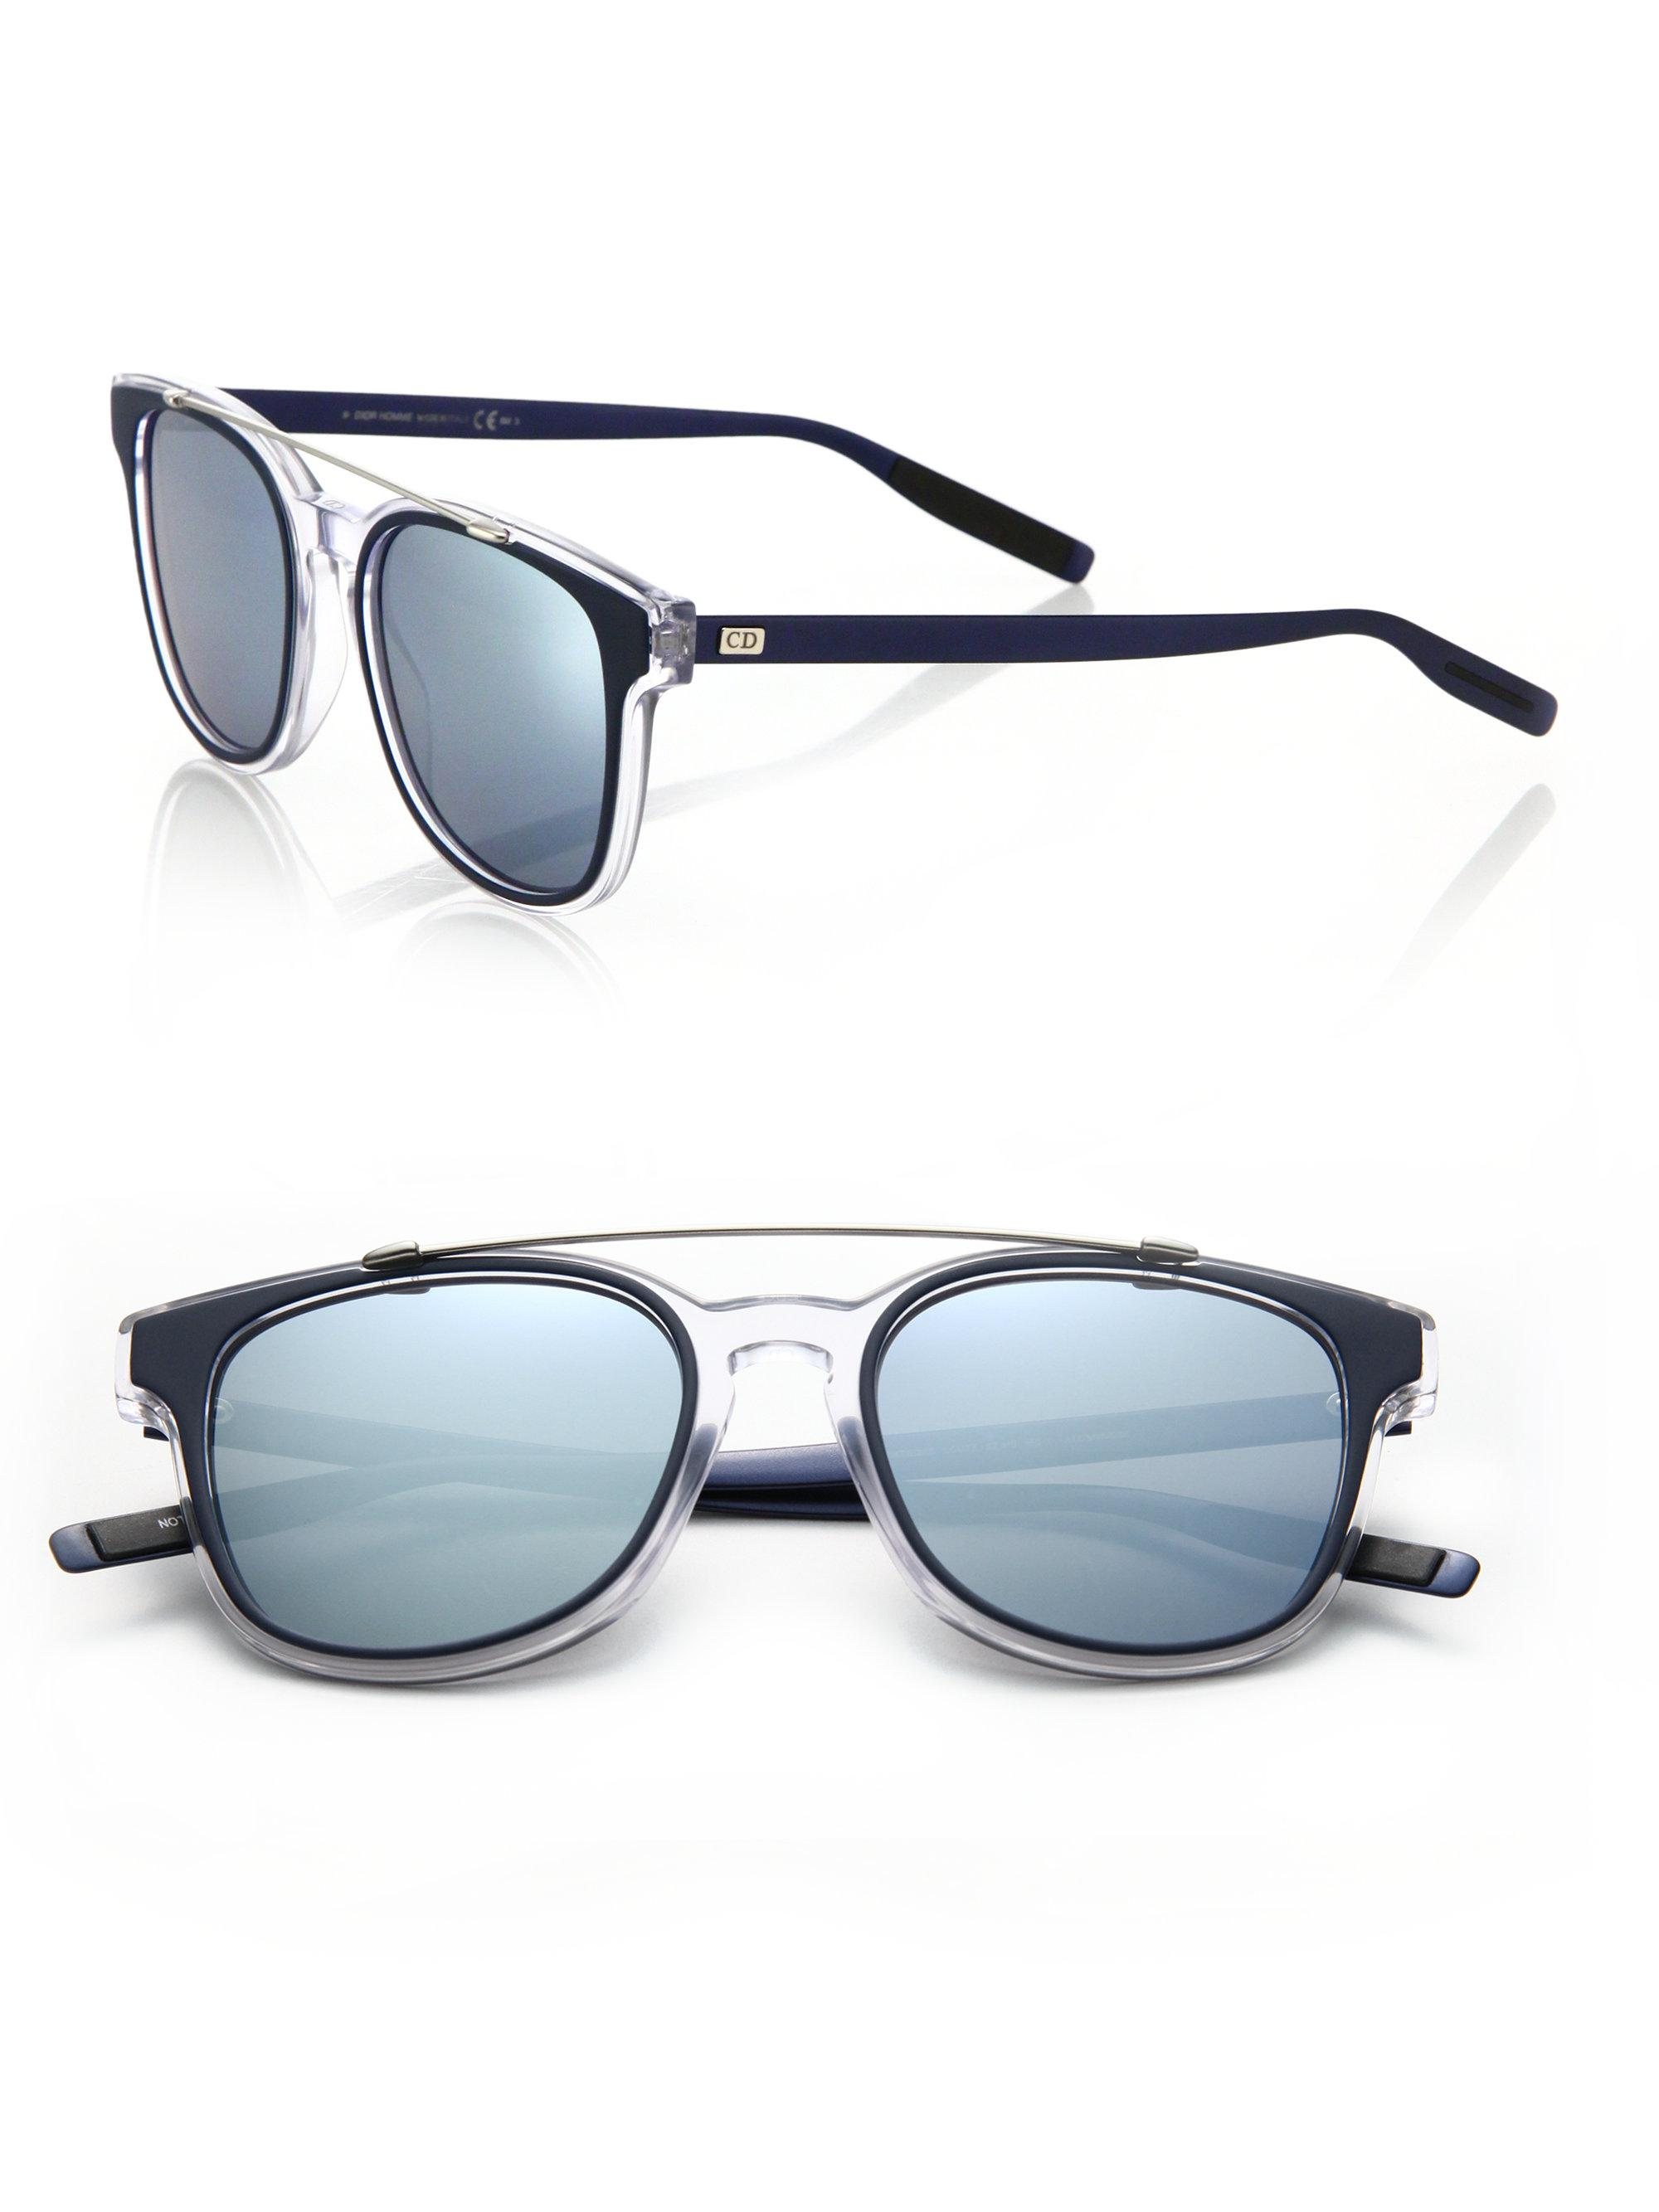 86c86252d6 Dior Homme Black Tie 211s 52mm Mirror Sunglasses in Blue for Men - Lyst